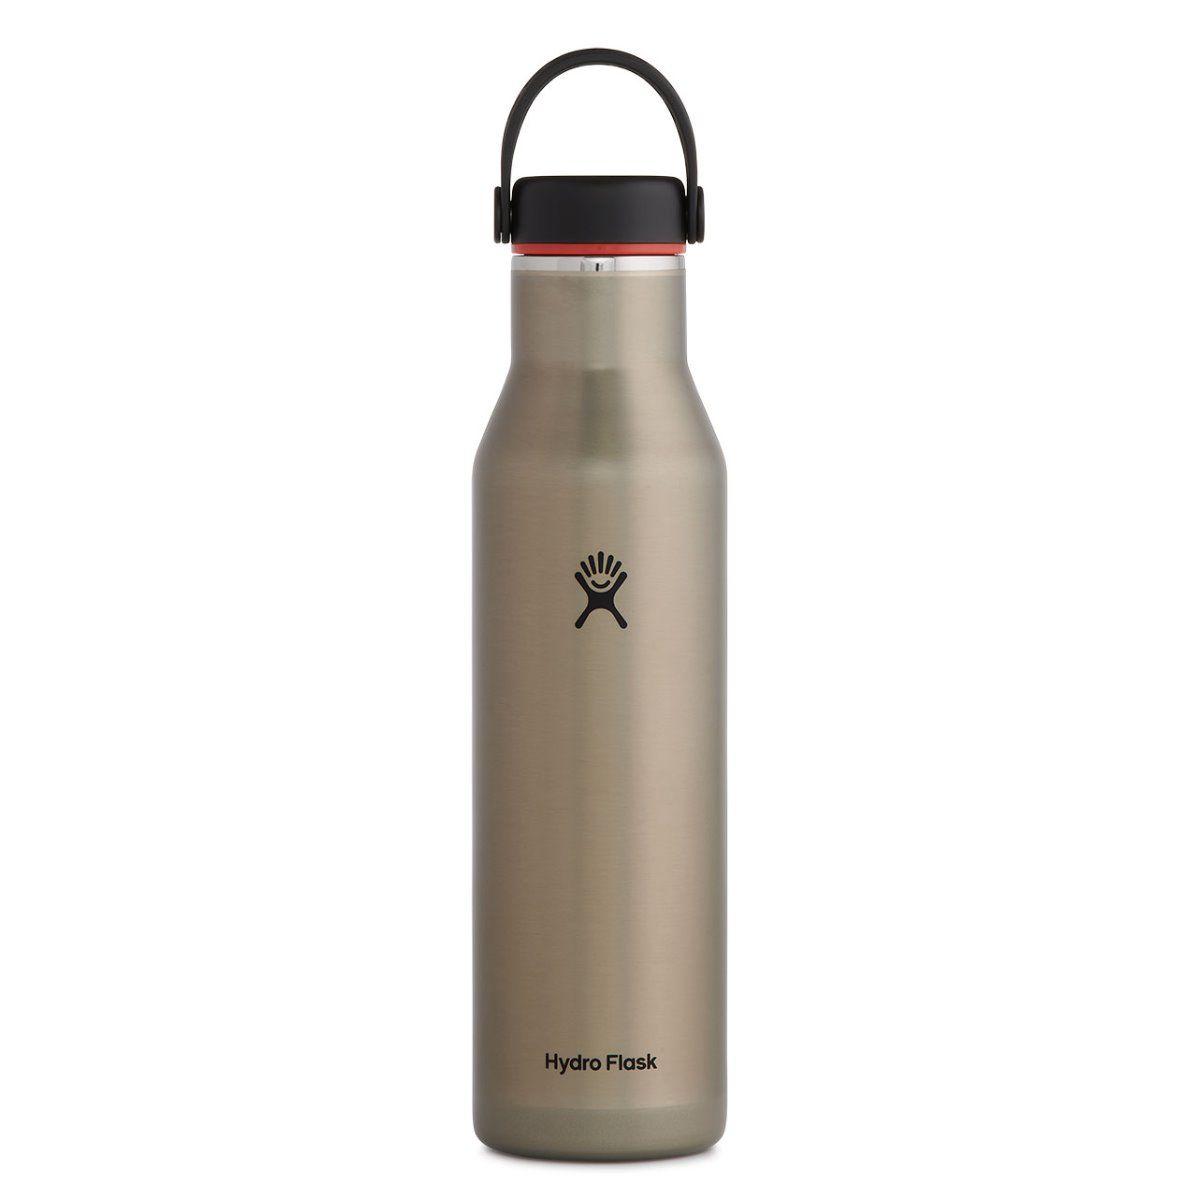 Hydro Flask\t21oz 621ml 標準口輕量真空保溫鋼瓶 板岩灰\tHFLW21LW081\tZ1273\t【Happy Outdoor 花蓮遊遍天下】